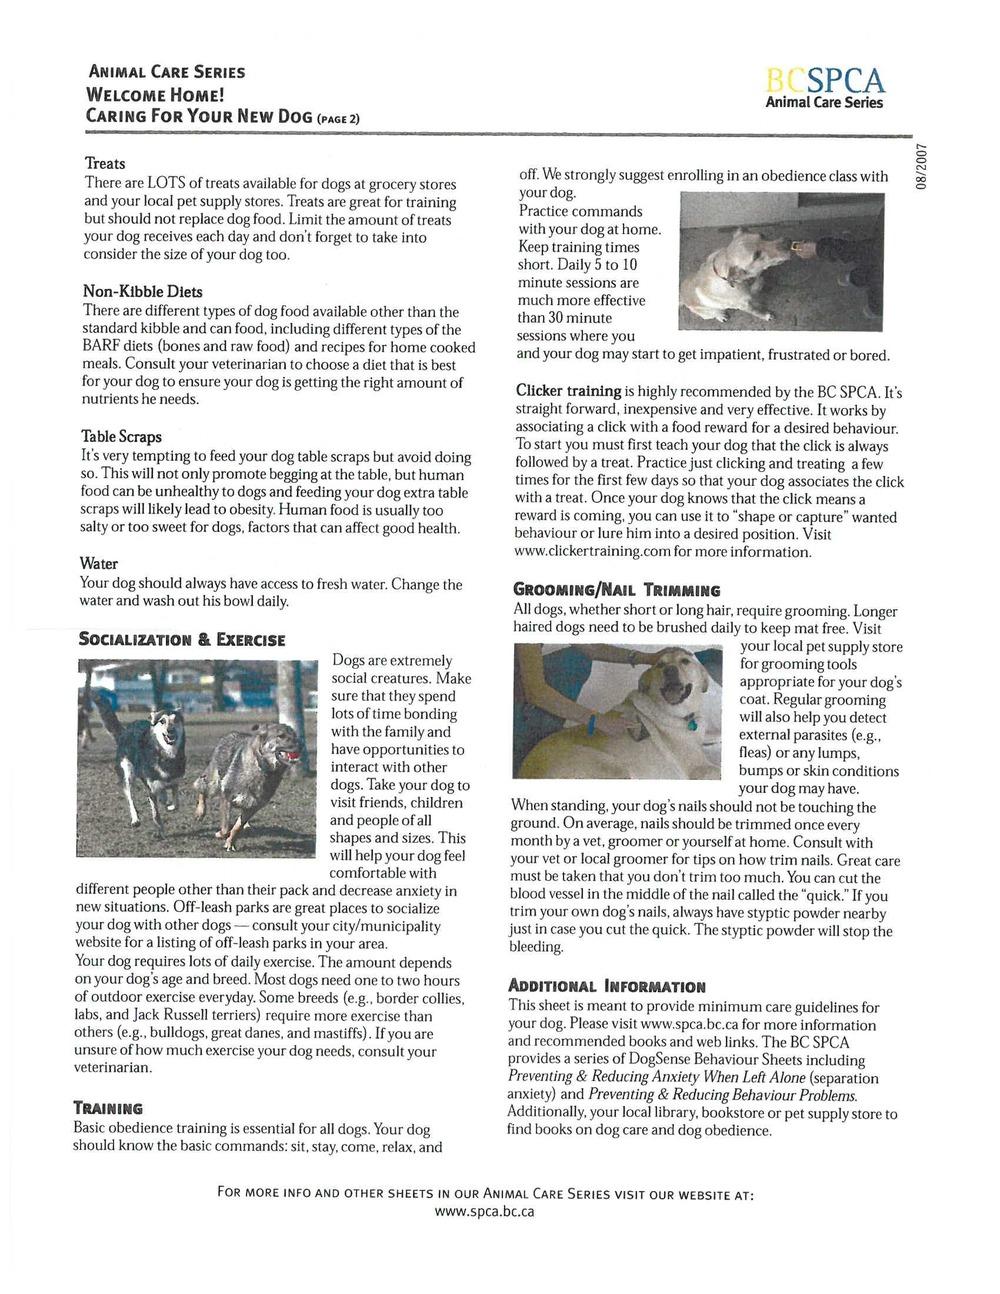 TFN_Bulletin_August_31_2015_Page_10.jpg